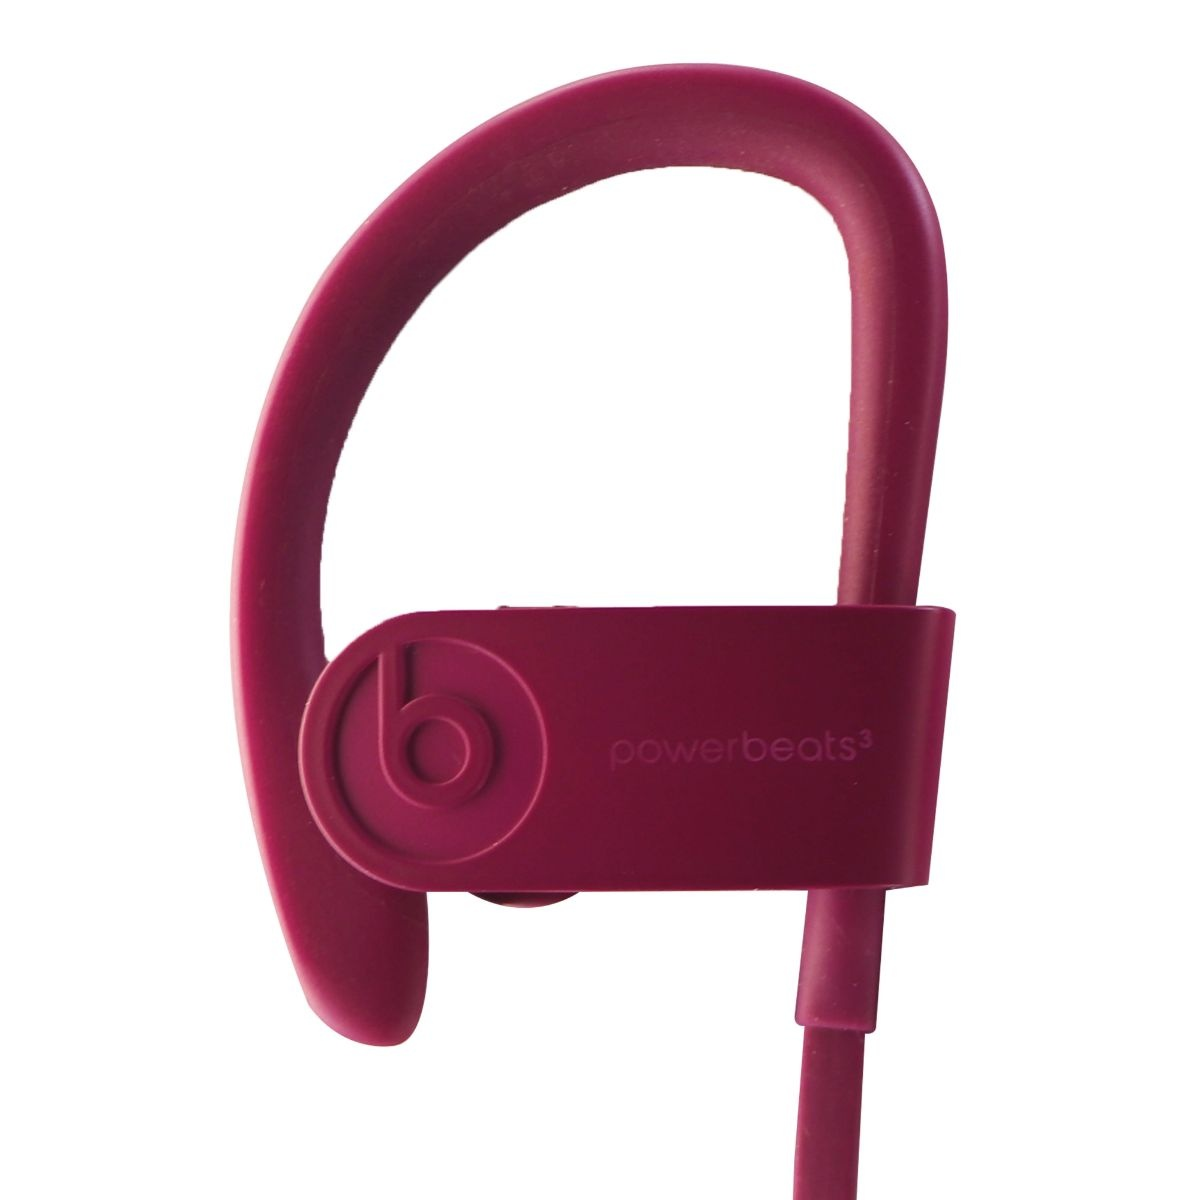 5e3b70f00f0 Home Headphones Beats Powerbeats3 Series Wireless Ear-Hook Headphones -  Brick Red (MPXP2LL/A). Moving Fast! prev